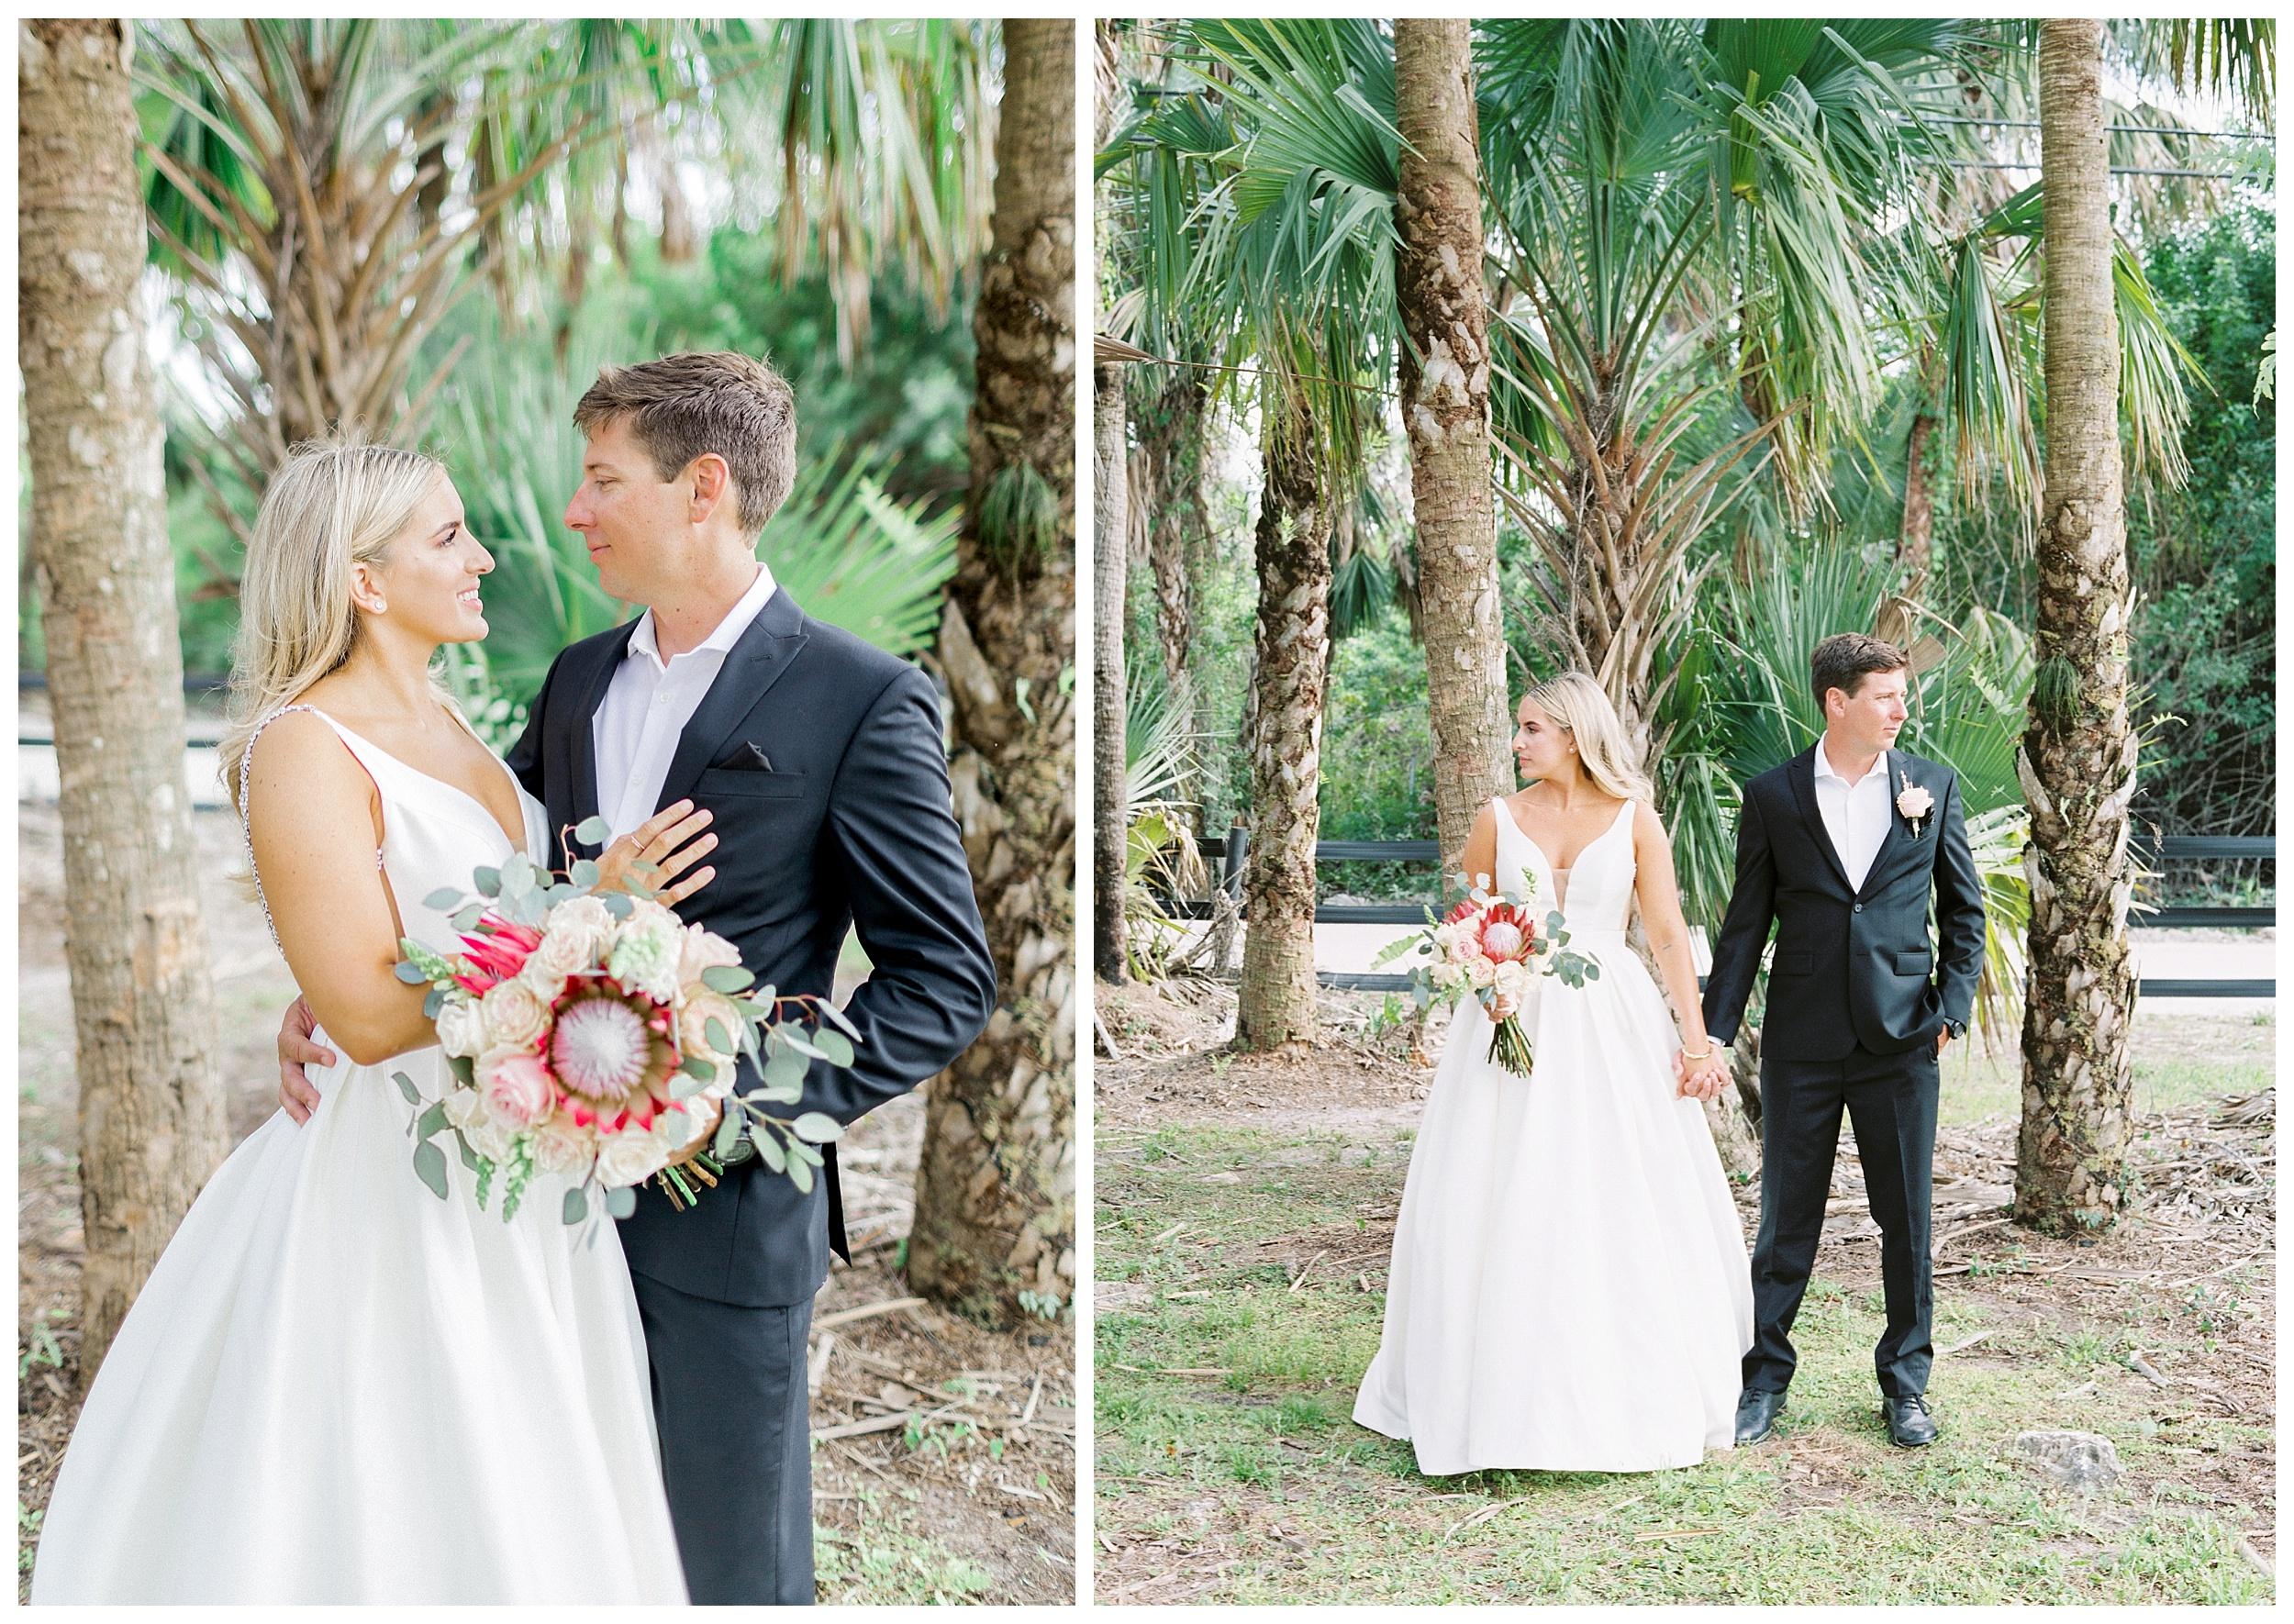 South Florida Wedding Photographer Kir Tuben_0037.jpg